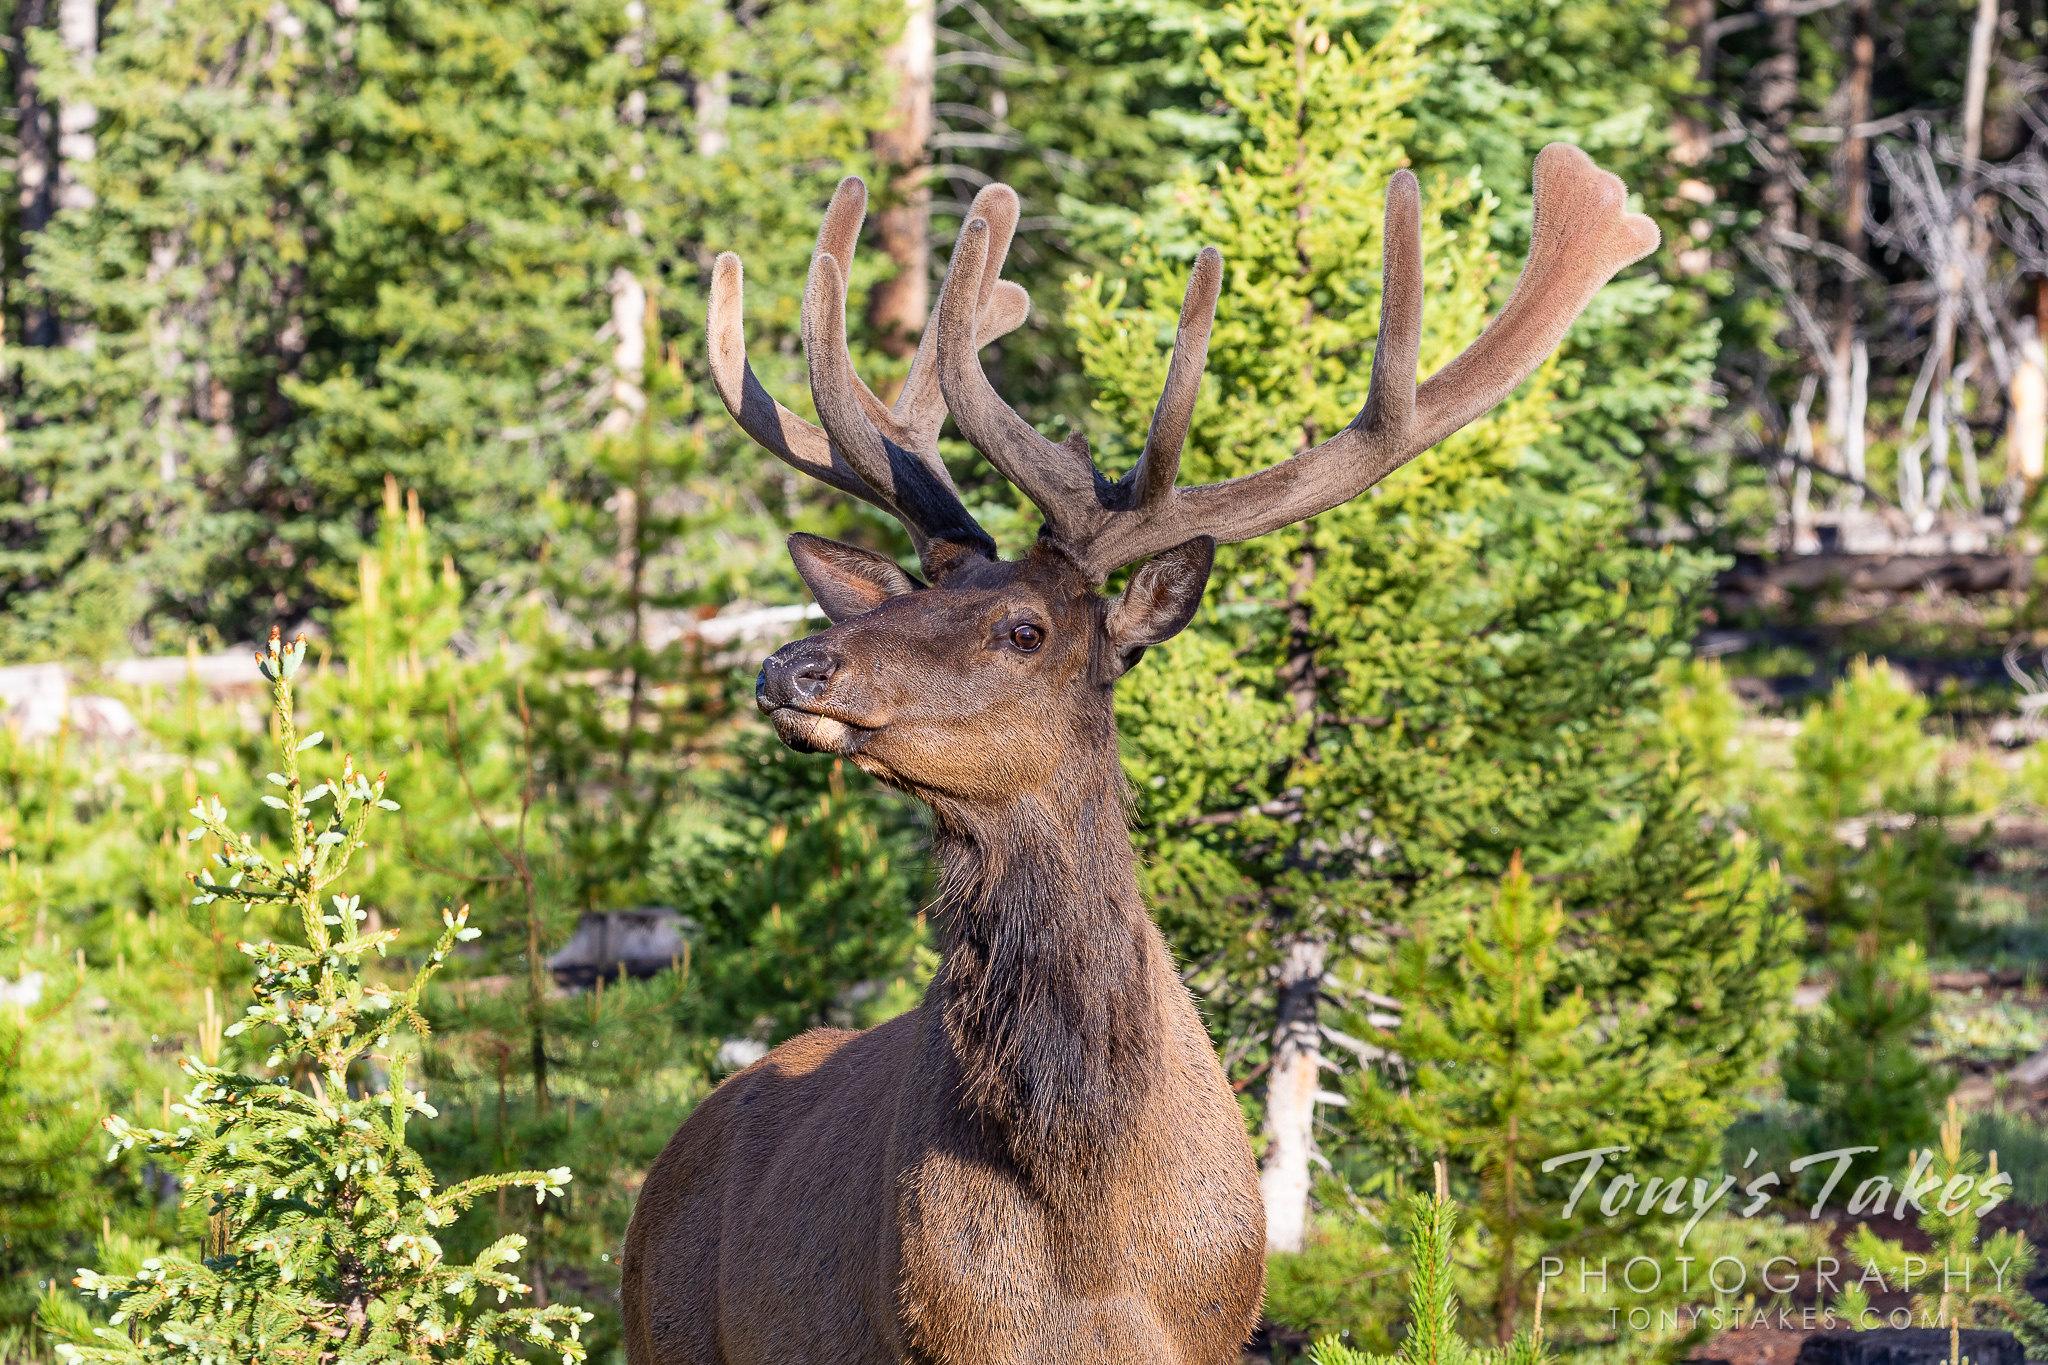 Elk bull gives the photographer the side-eye